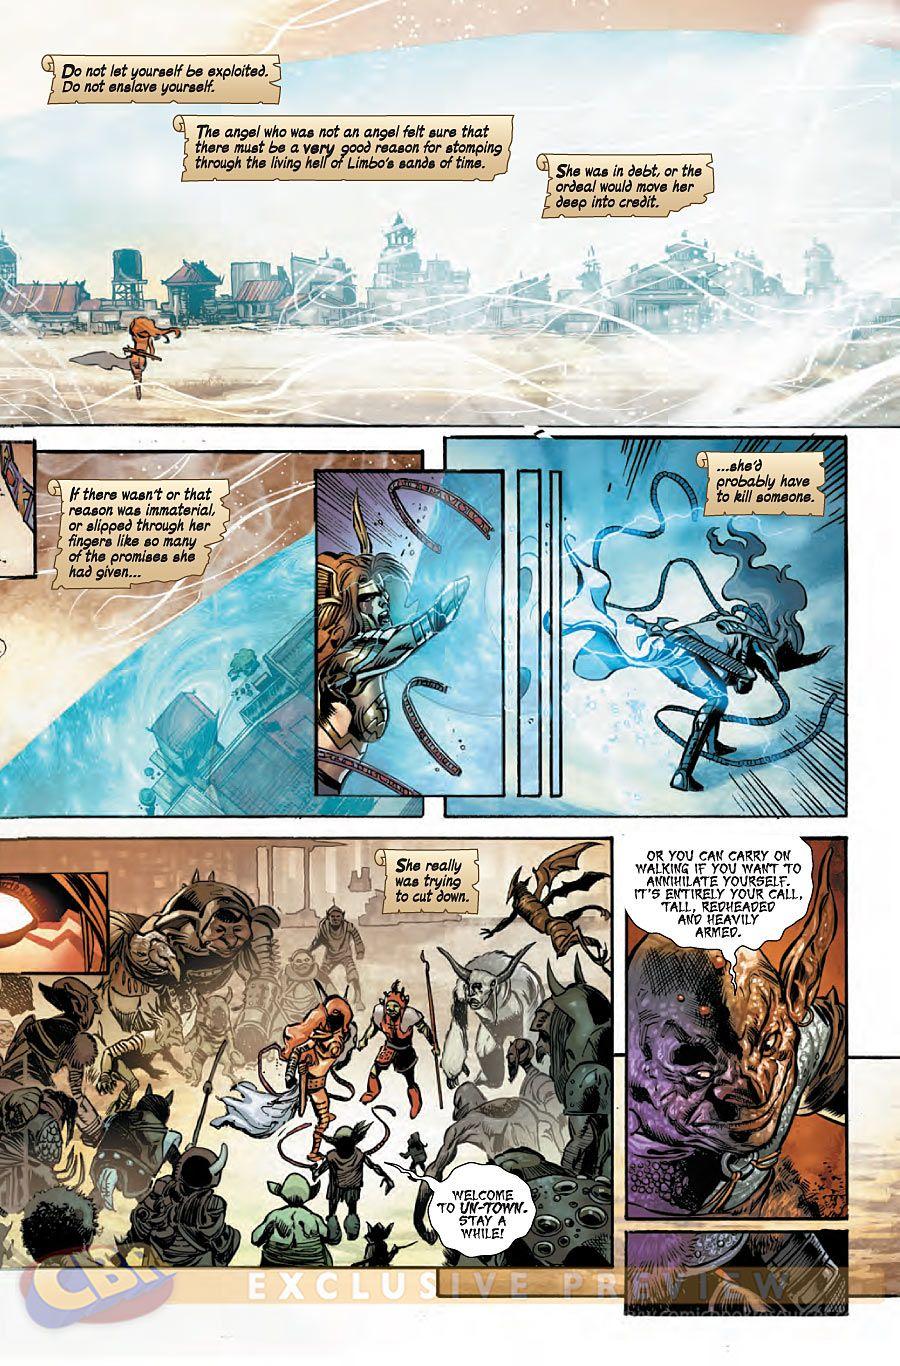 Preview: Angela: Asgard's Assassin #1,   Angela: Asgard's Assassin #1 Story: Kieron Gillen & Marguerite Bennett Art: Phil Jimenez, Tom Palmer & Stephanie Hans Cover A: Stephani..., http://all-comic.com/2014/preview-angela-asgards-assassin-1/,  #All-Comic #All-ComicPreviews #Angela:Asgard'sAssassin #Comics #DanGreen #FrankD'Armata #JoeQuesada #KieronGillen #MargueriteBennett #Marvel #PhilJimenez #Previews #SkottieYoung #StephanieHans #TomPalmer